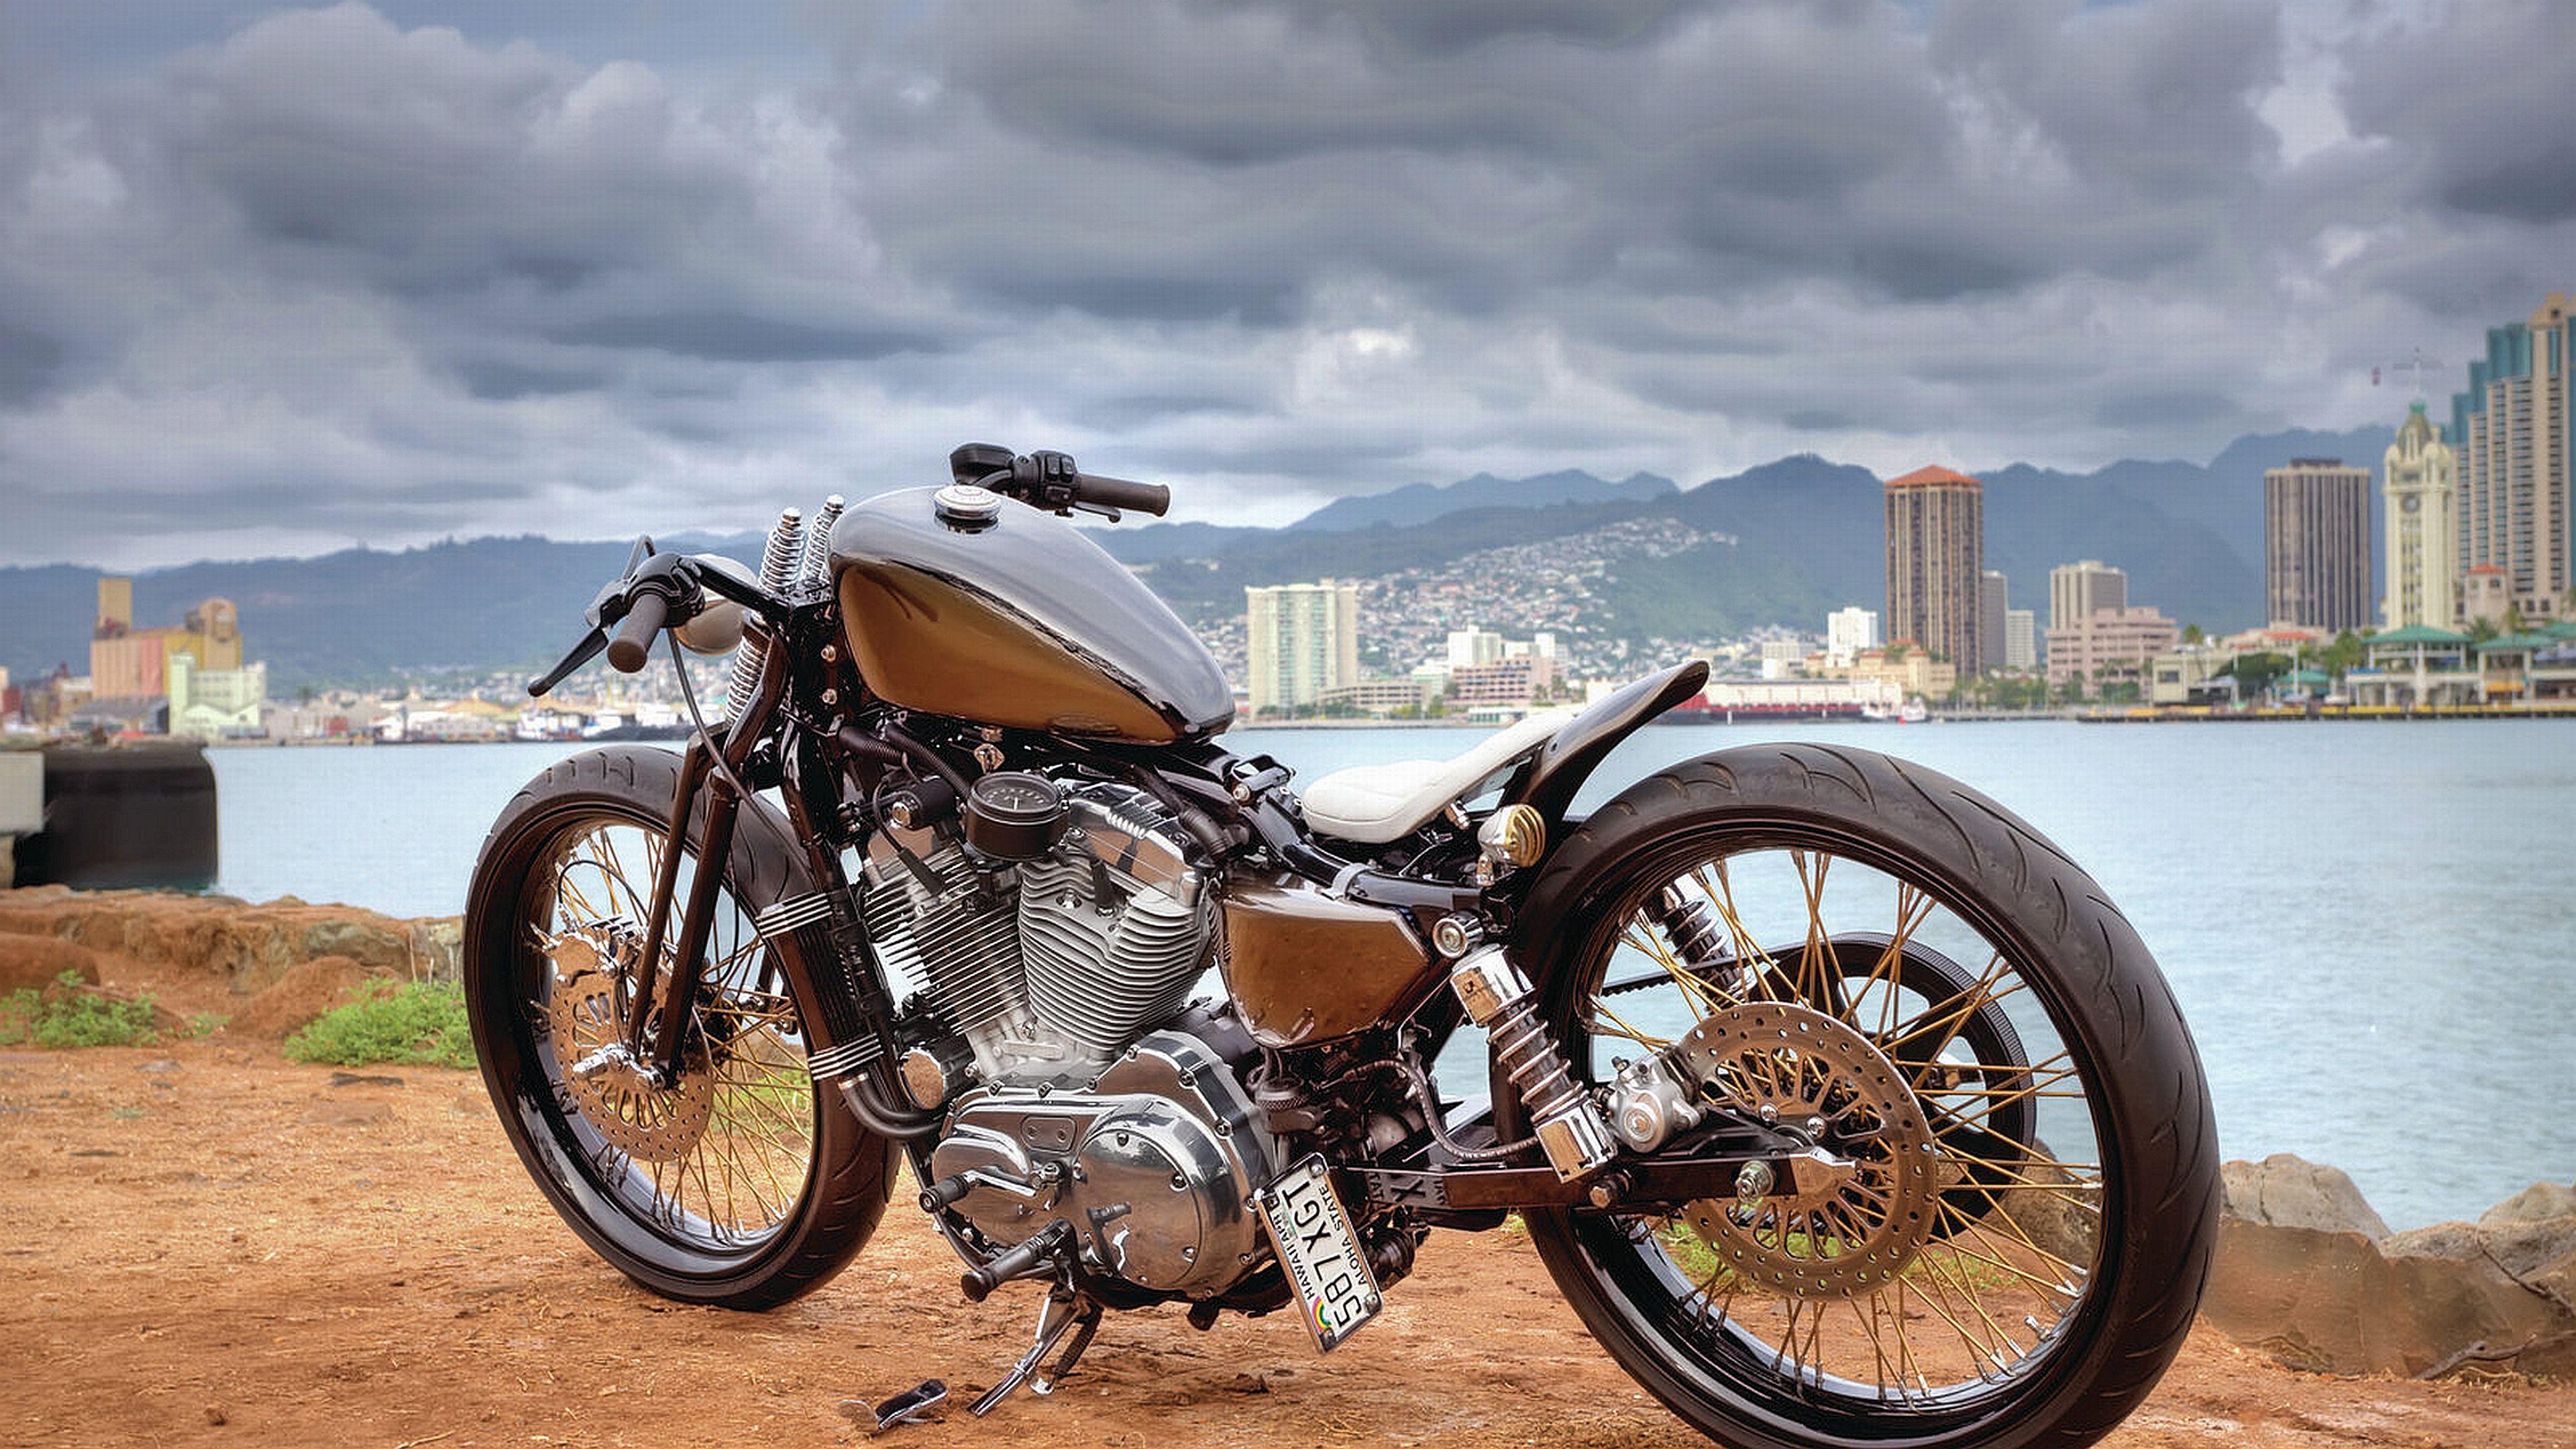 Harley Biker Wallpaper Harley Davidson Amazing Harley Bobber